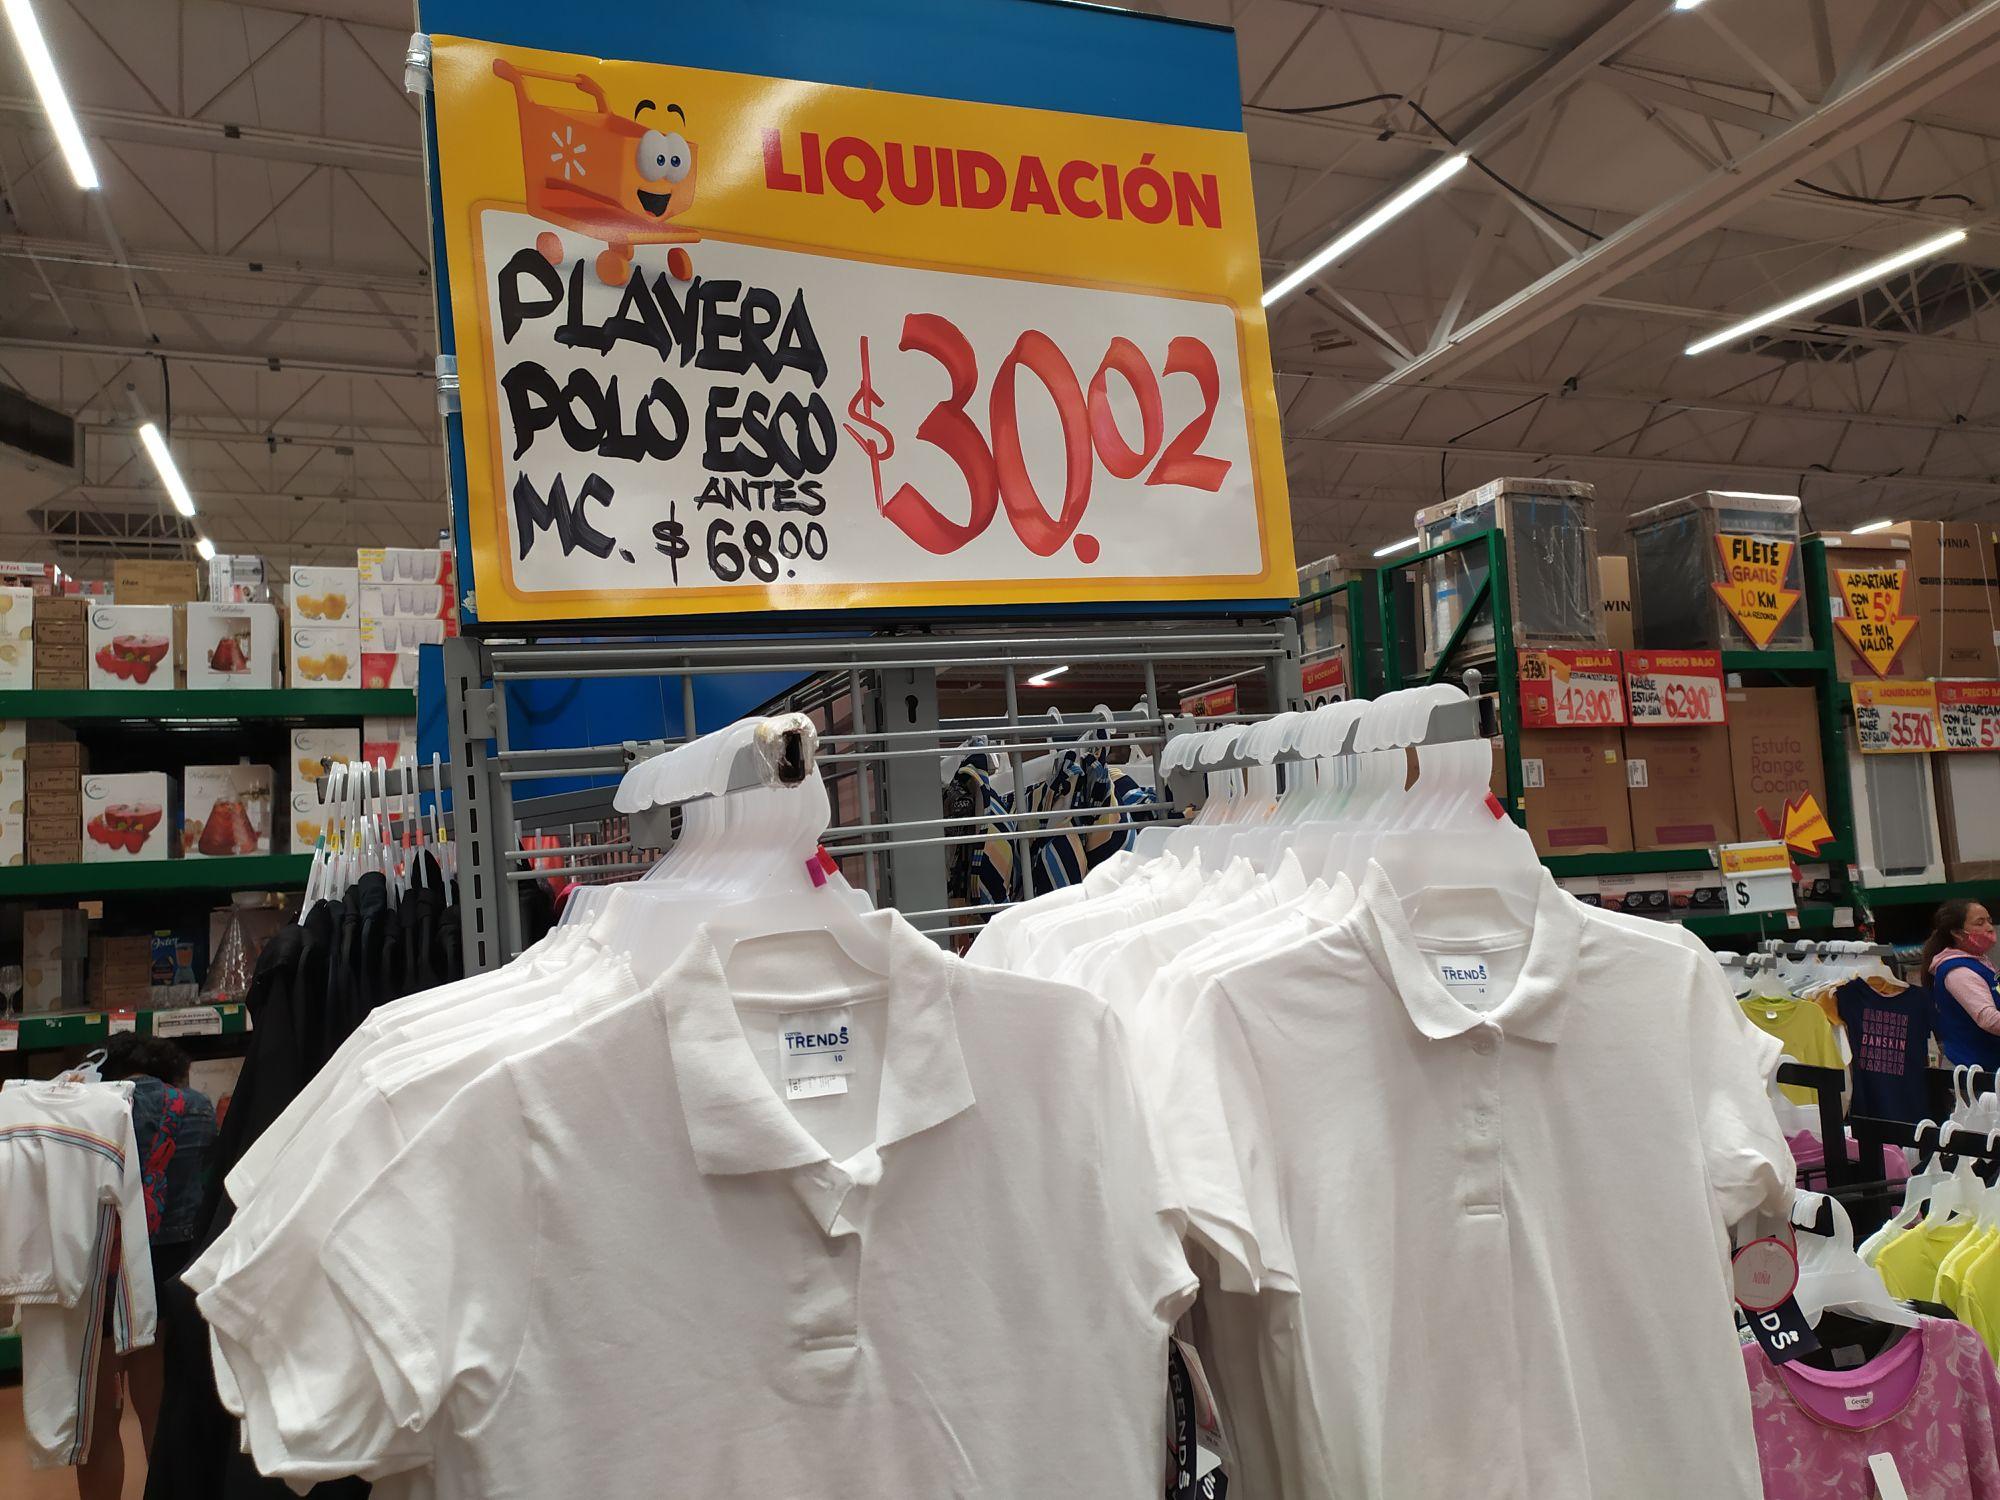 Walmart: Playera Polo Escolar Todas Las Tallas En Liquidacion.